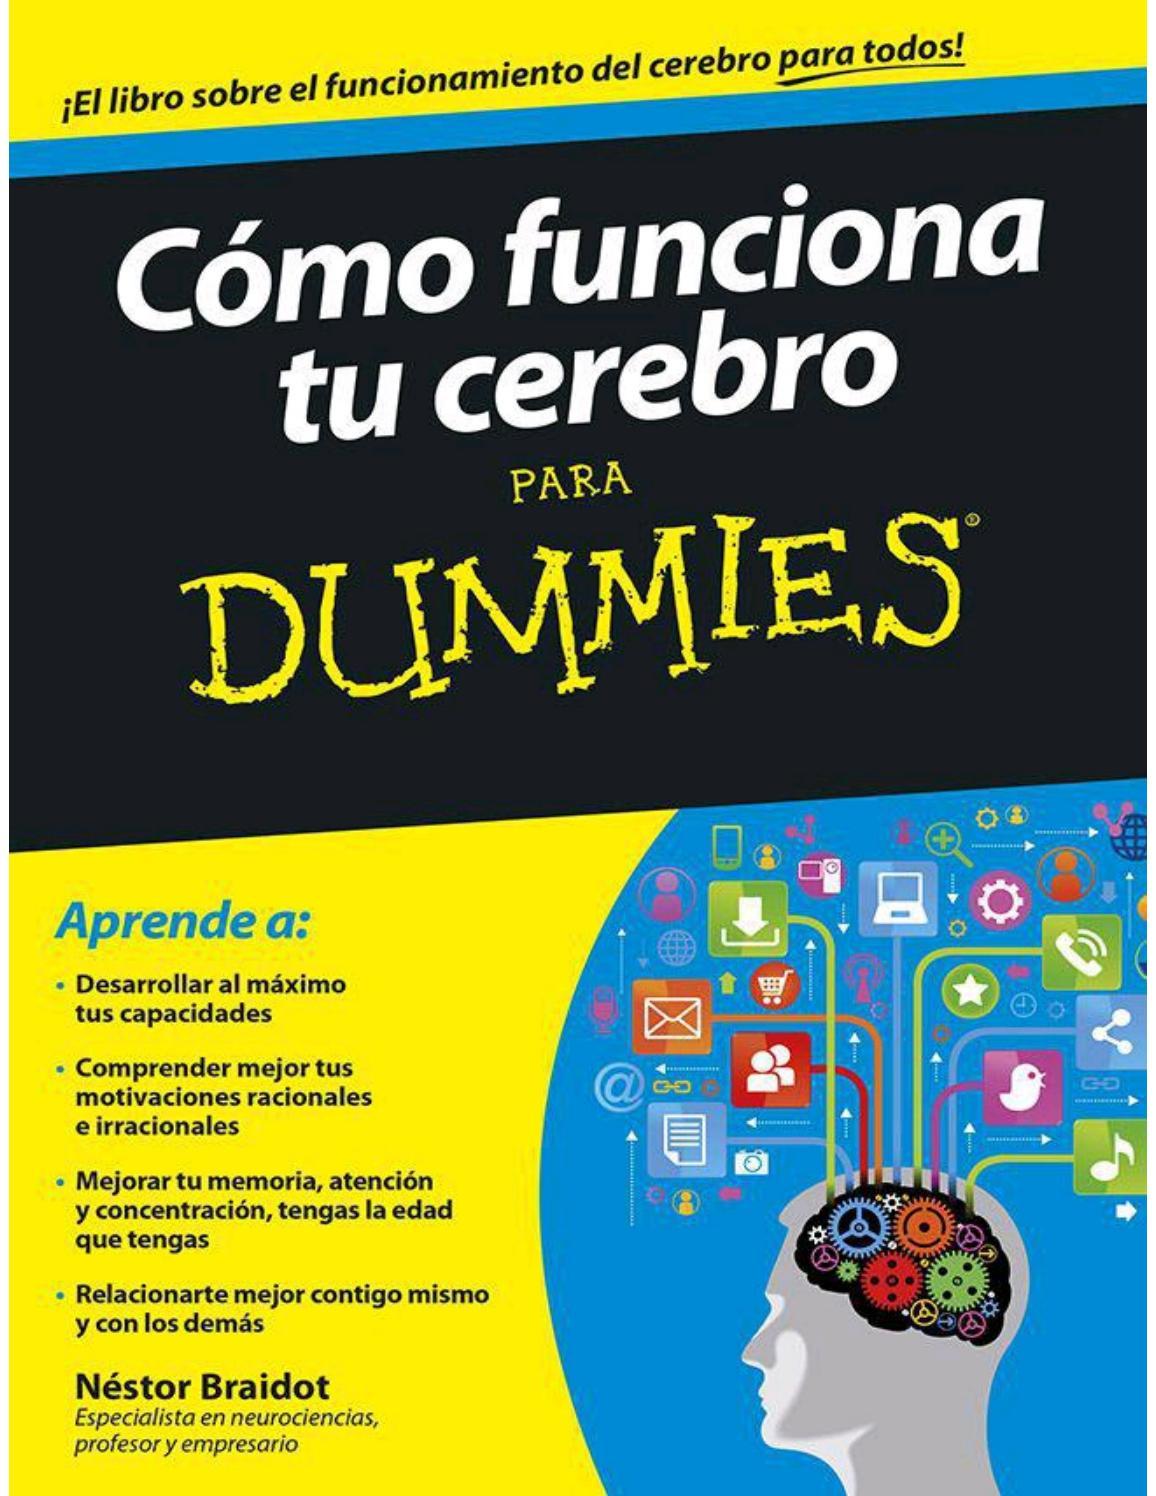 Cómo funciona tu cerebro para dummies by henry hdz - issuu